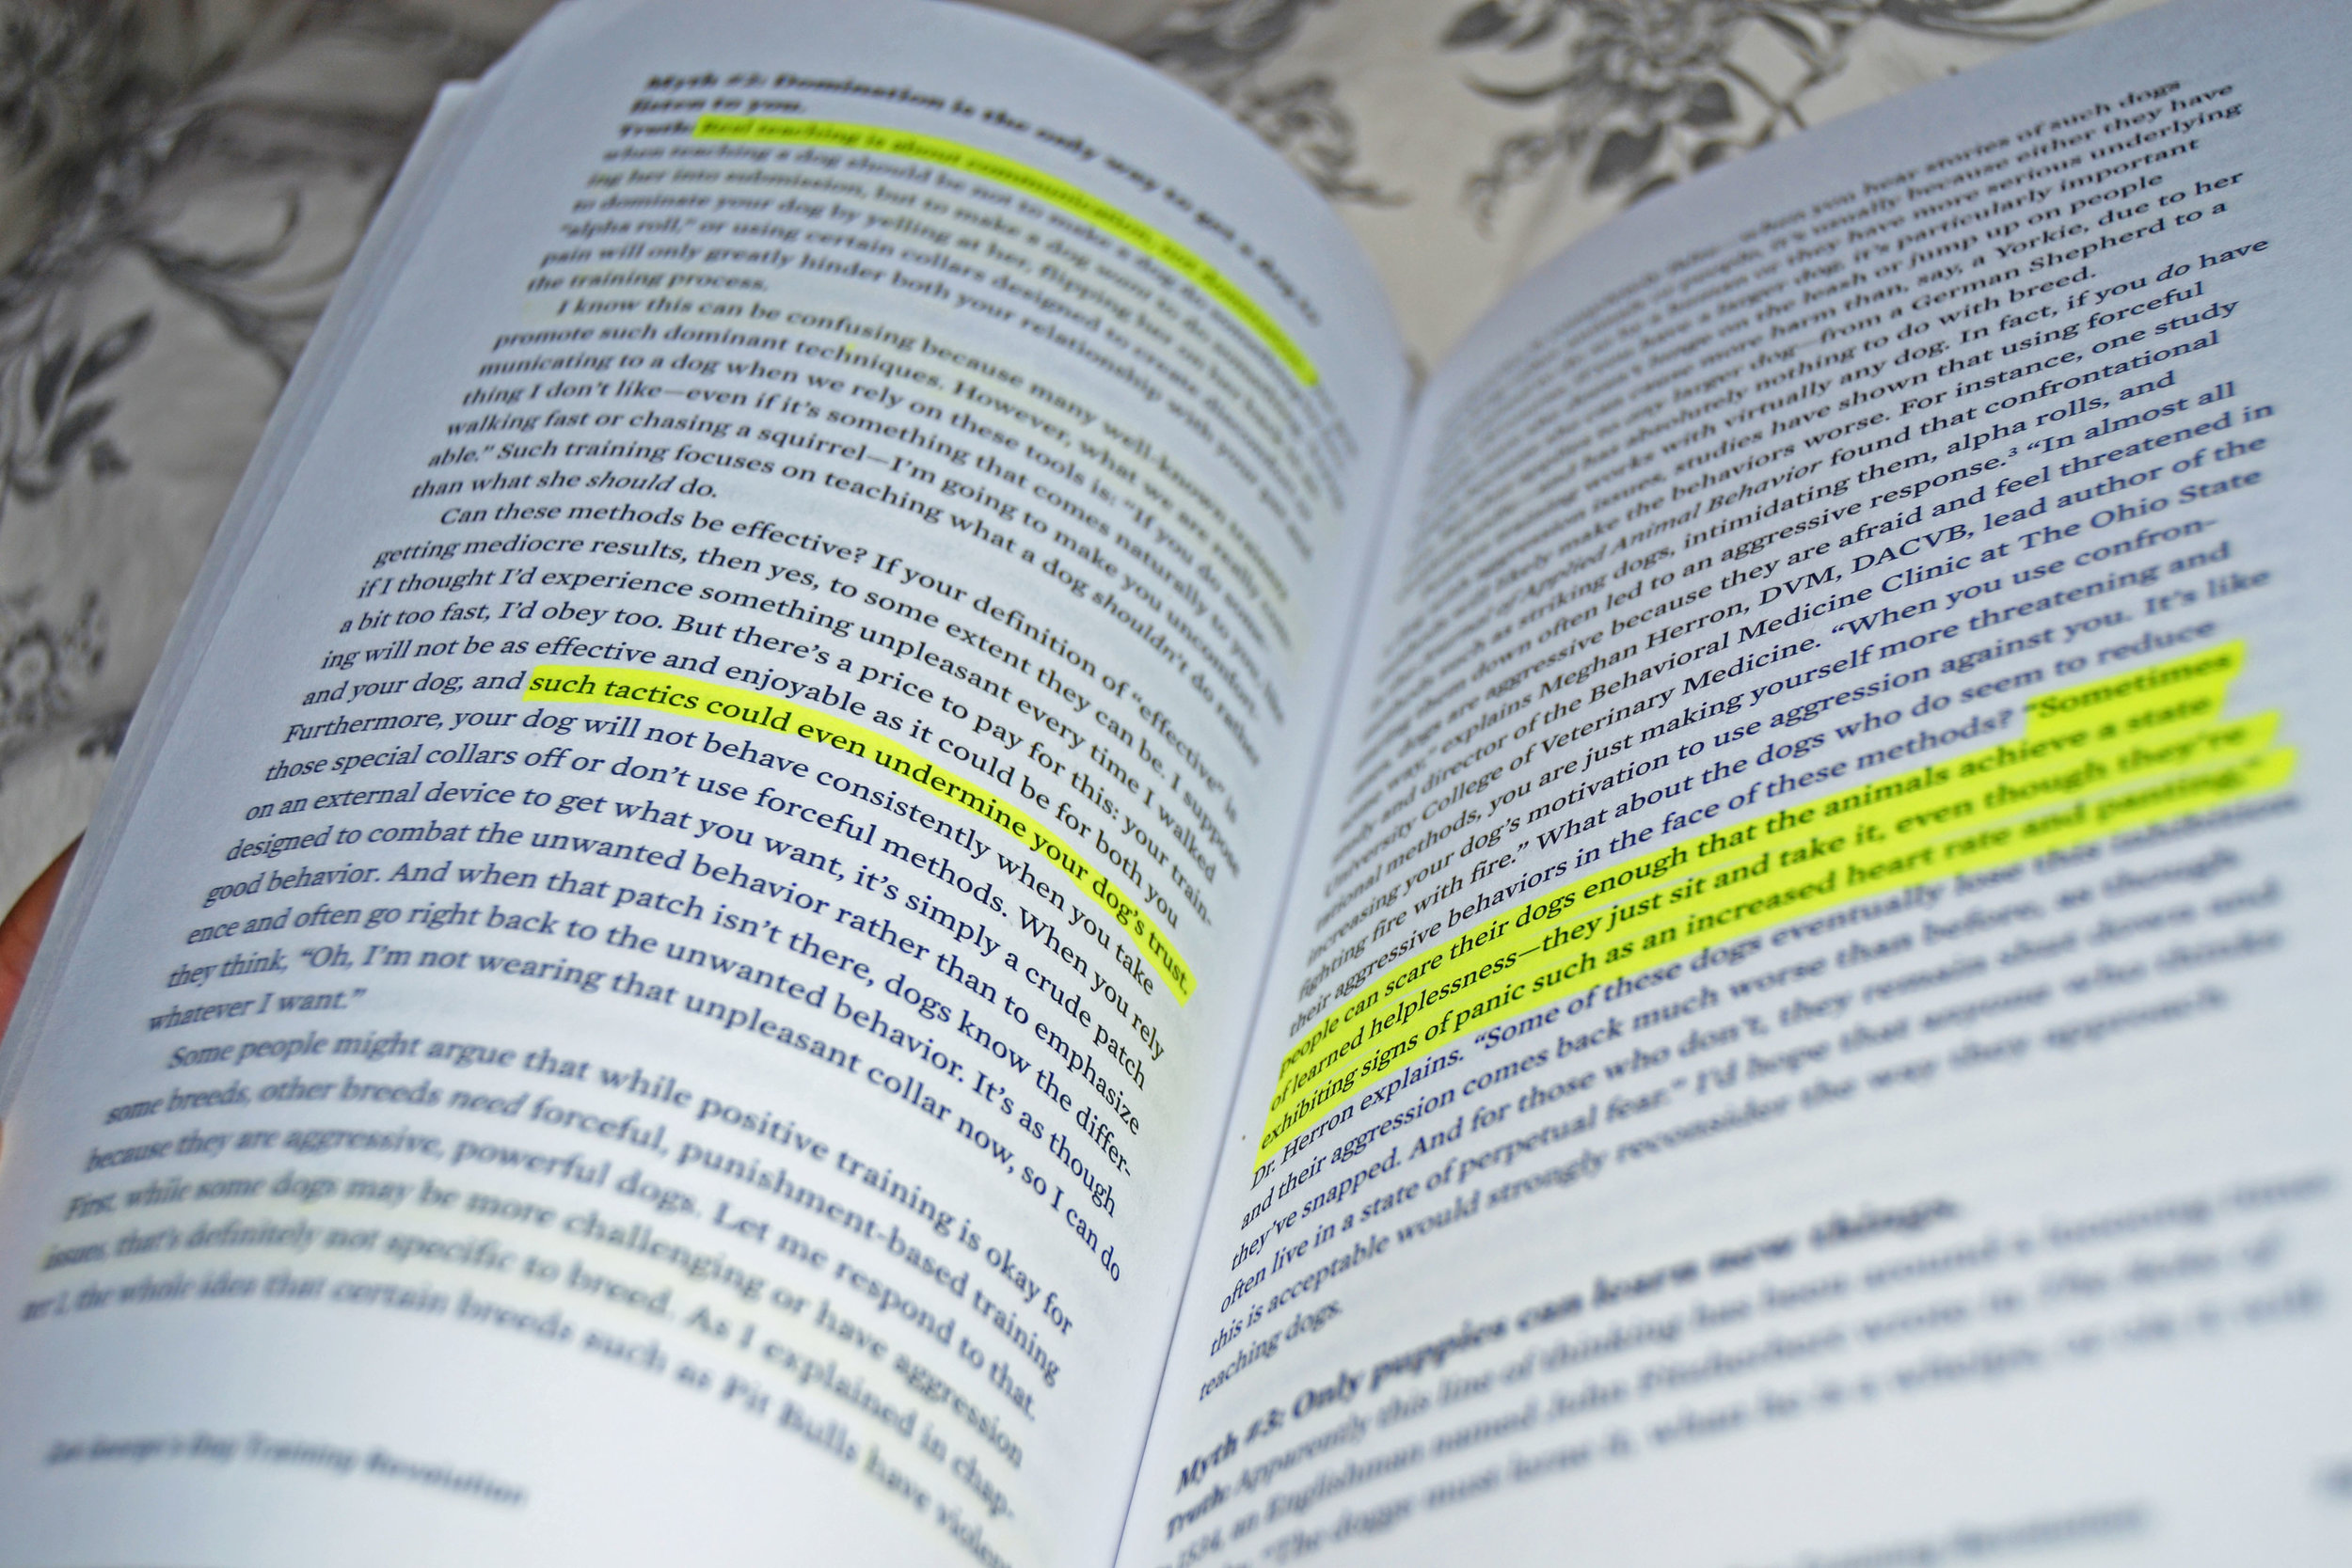 Zak-book-highlight.jpg